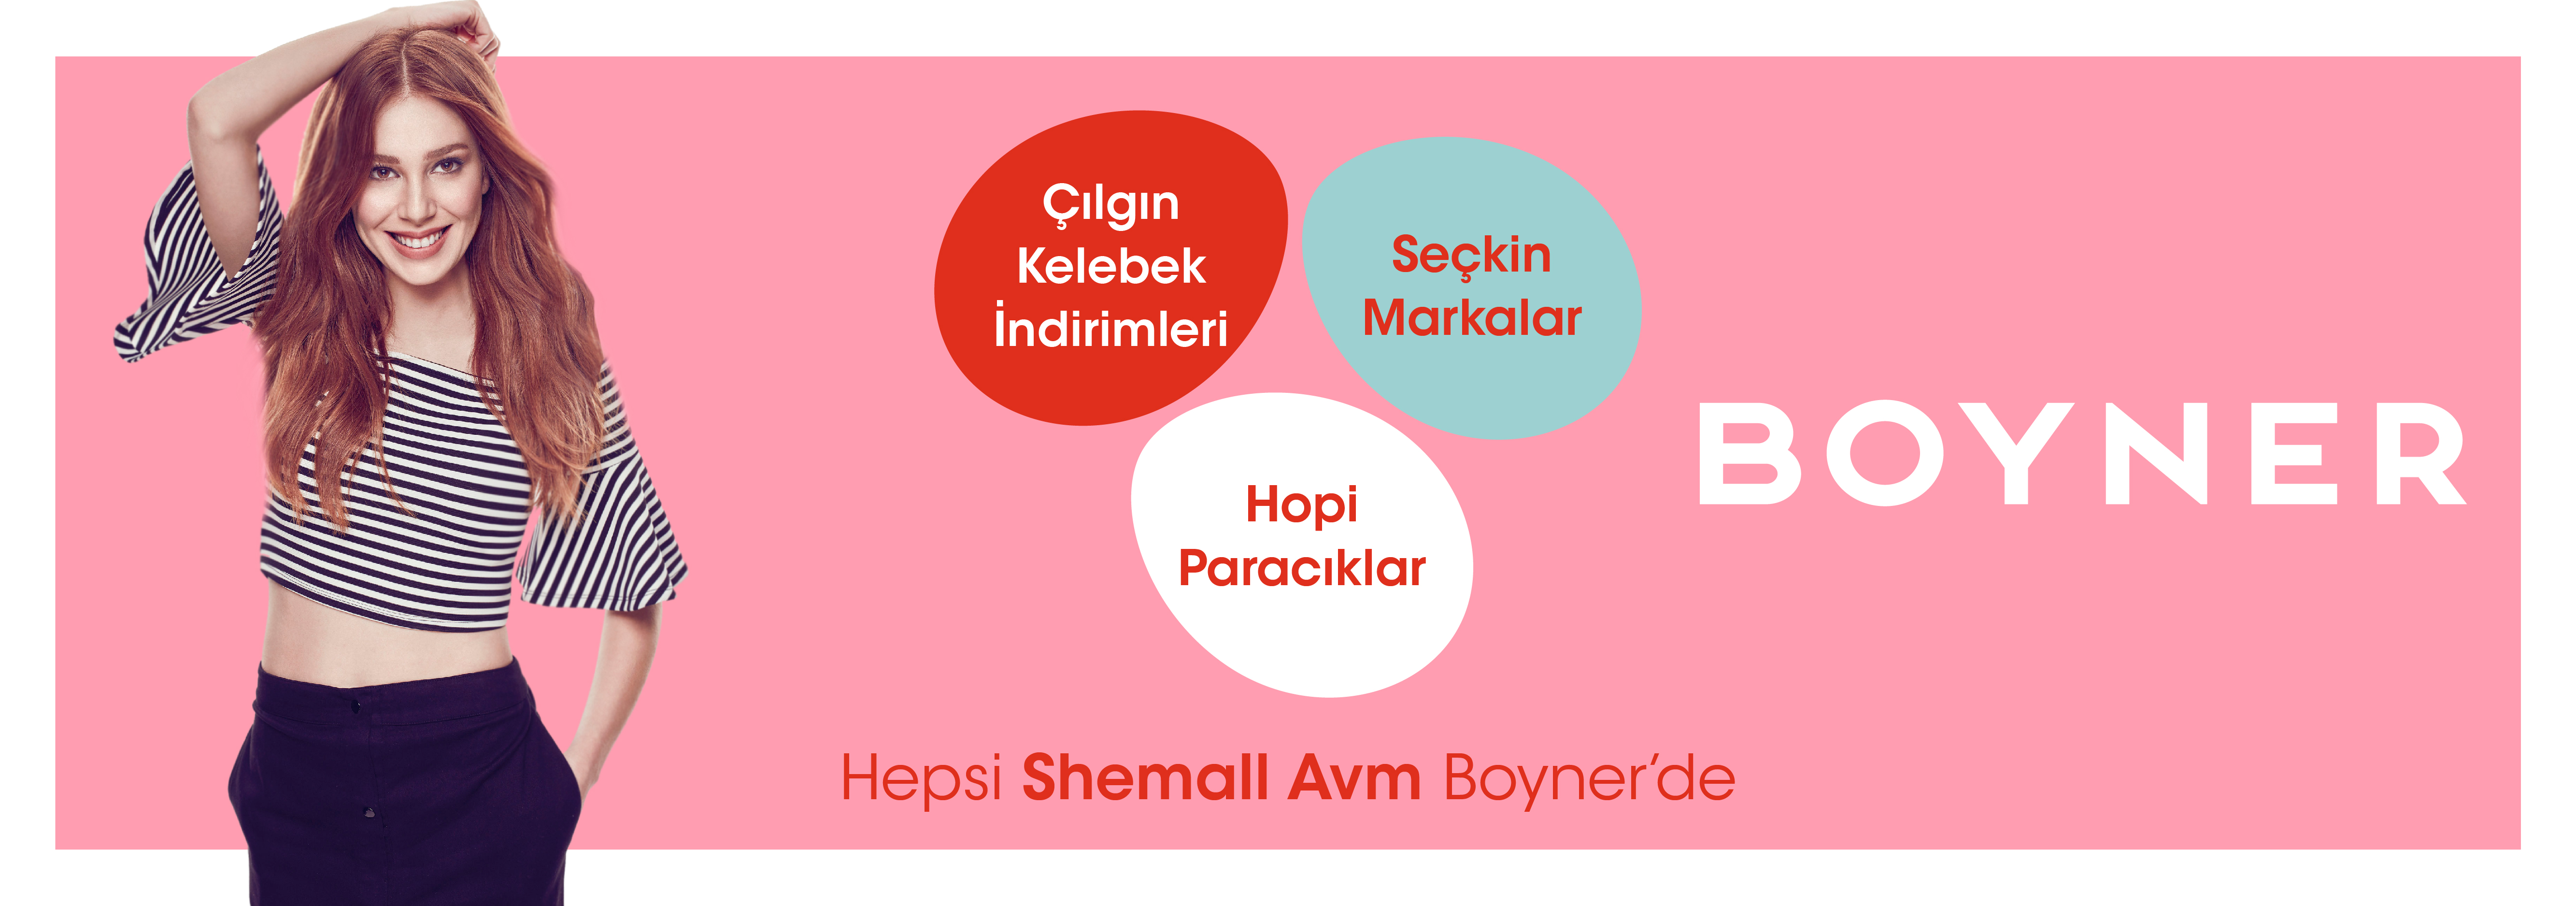 boyner-web-slayt-04